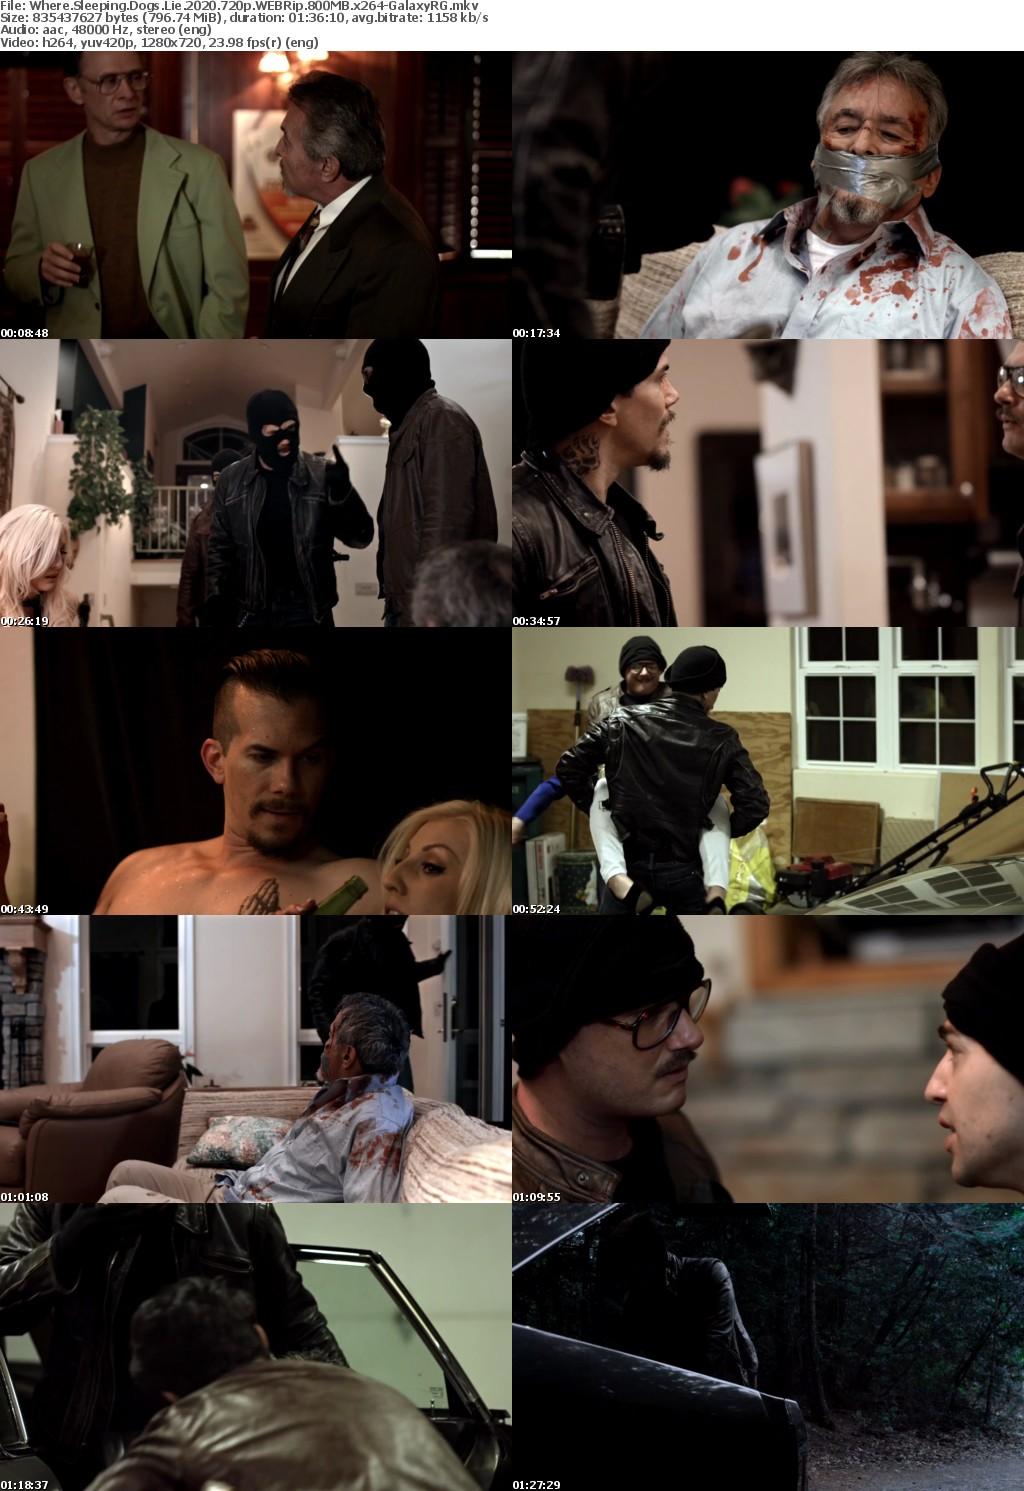 Where Sleeping Dogs Lie (2020) 720p WEBRip 800MB x264-GalaxyRG